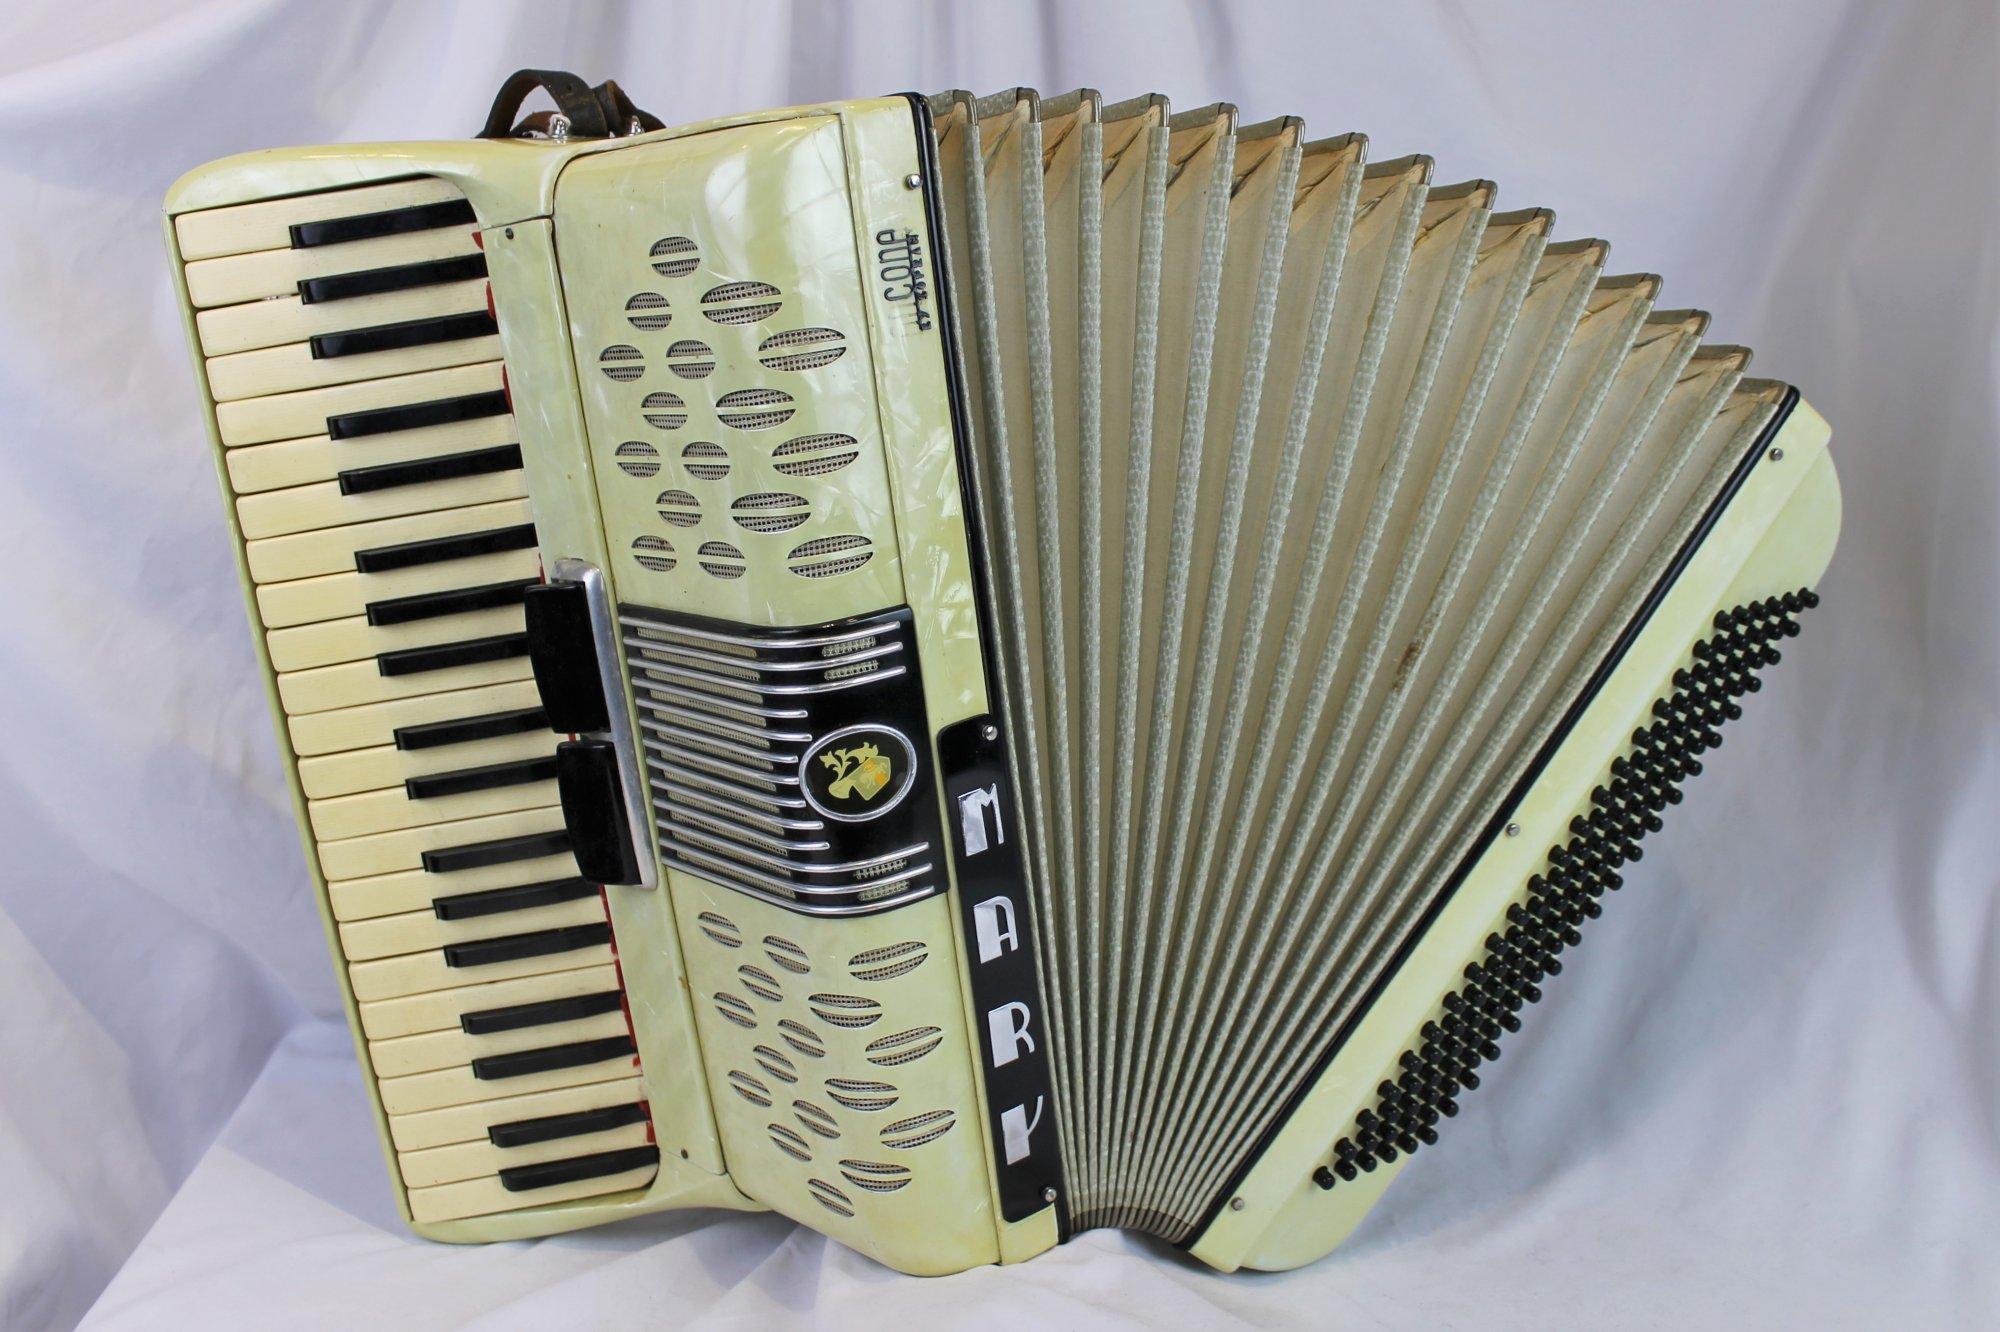 4619 - Cream Ancona Mary Piano Accordion LM 41 120